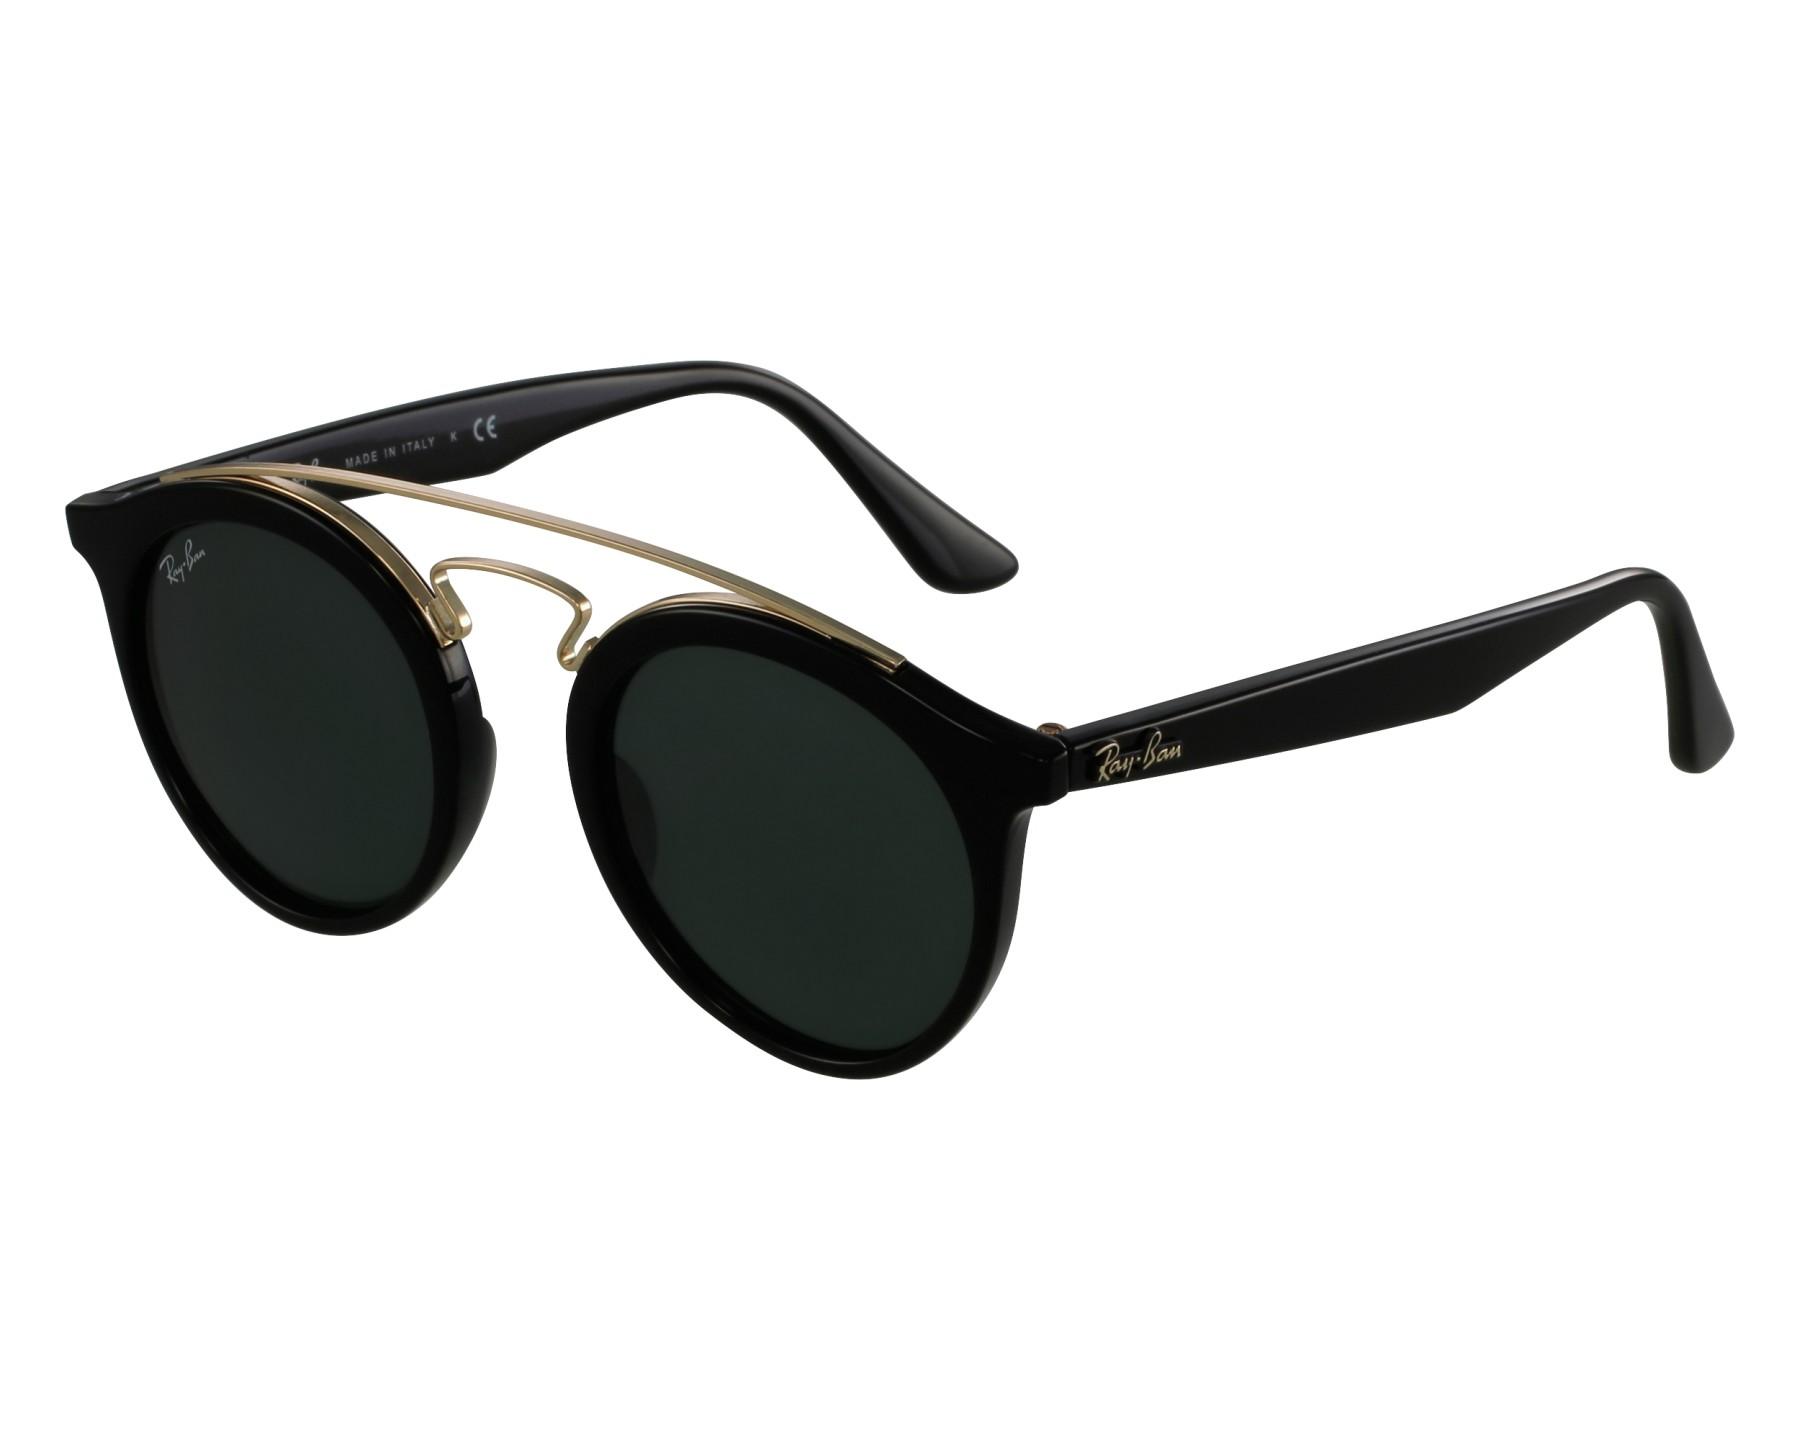 cb6cb92274fc83 Sunglasses Ray-Ban RB-4256 601 71 46-20 Black Gold front